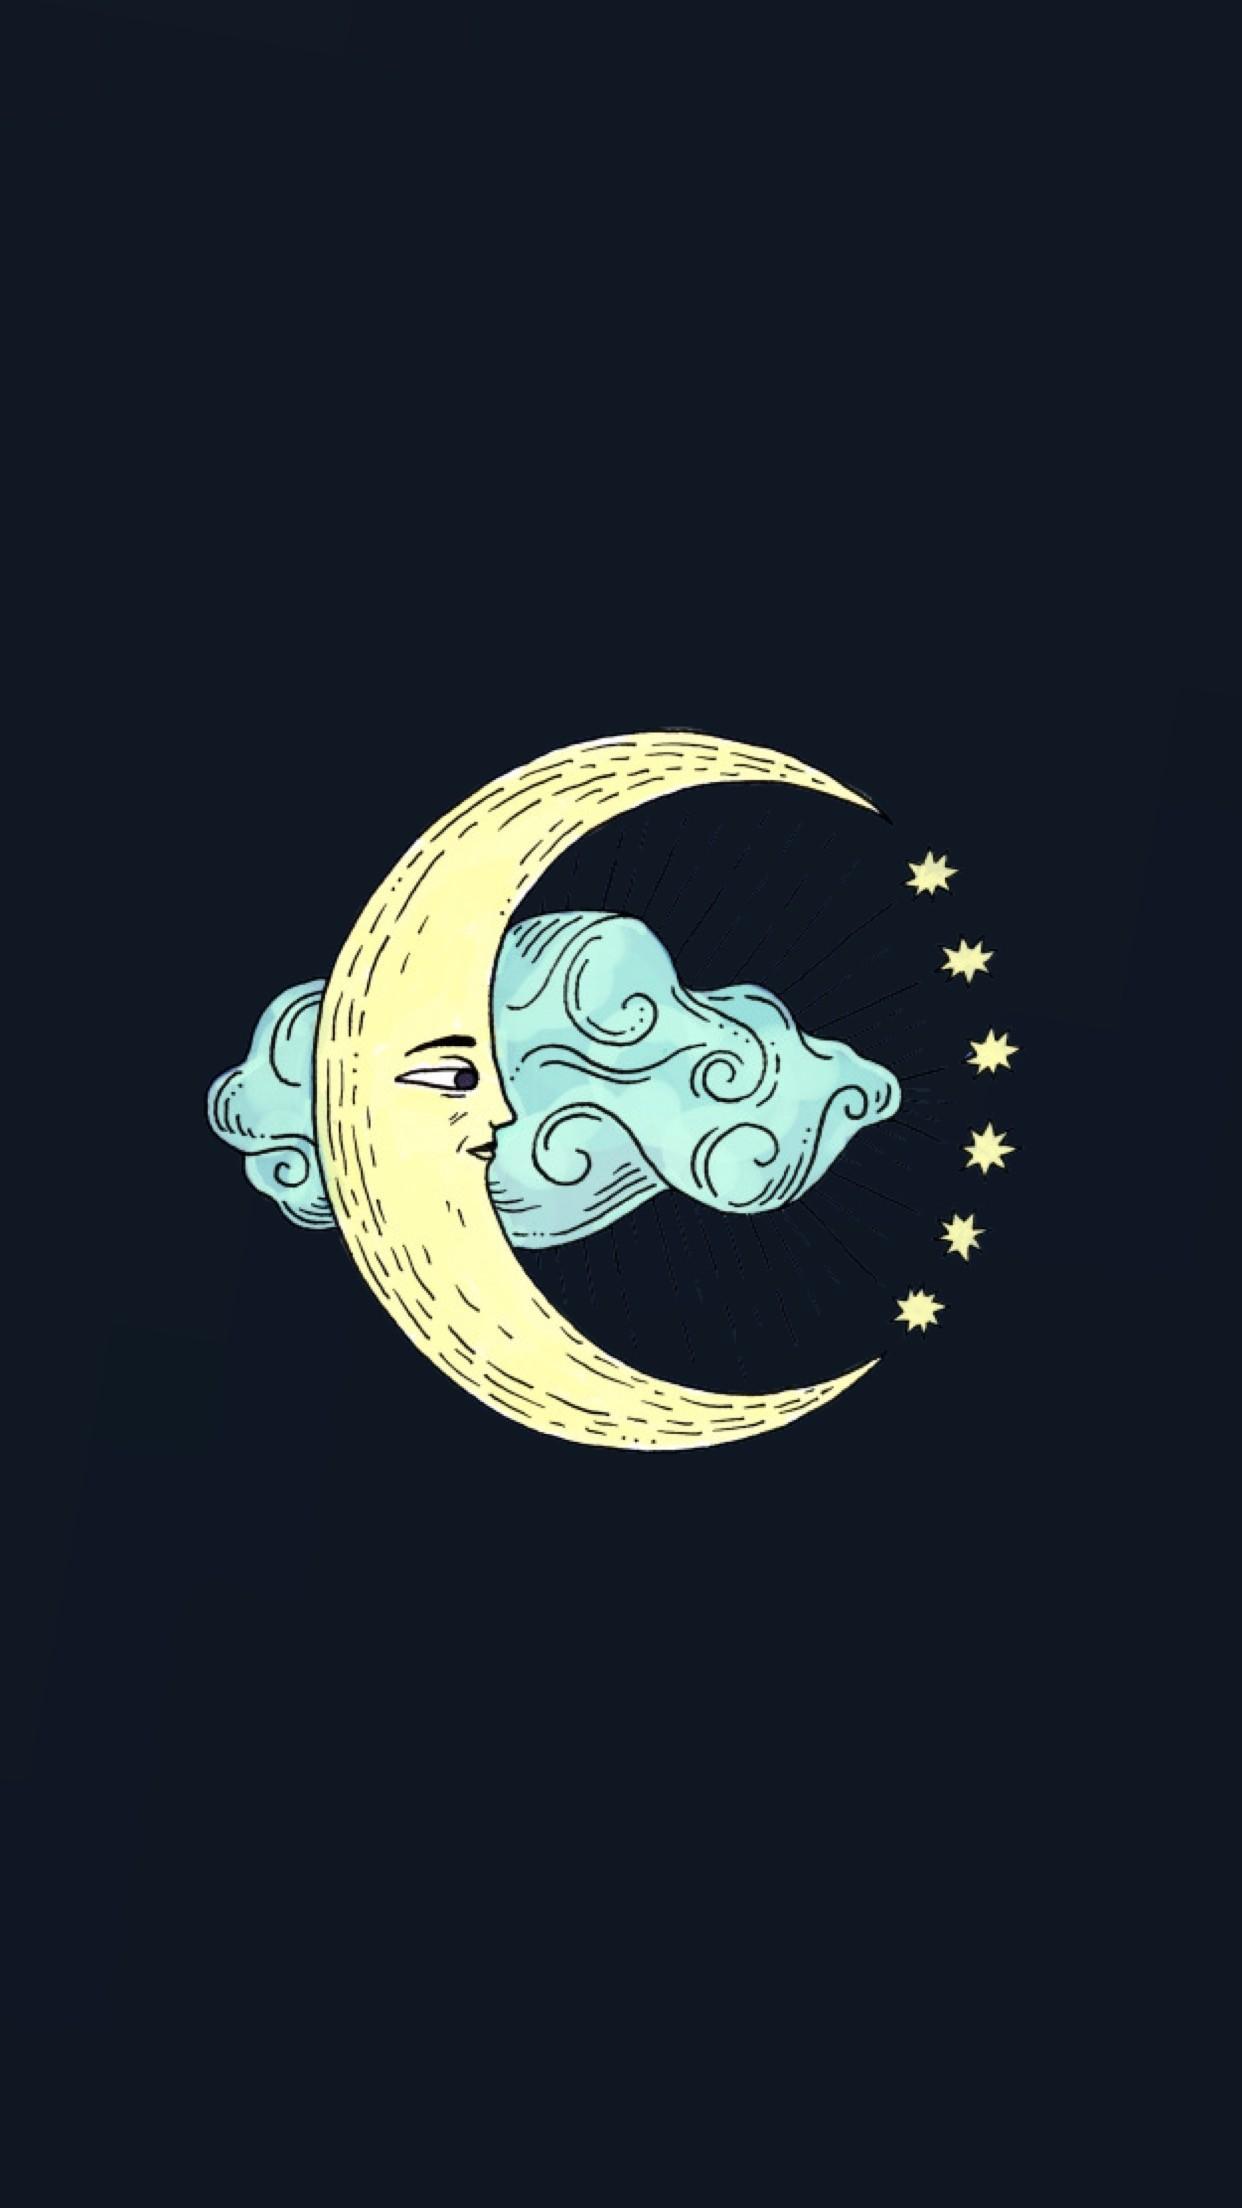 Moon in the clouds wallpaper   made by Laurette   instagram:@laurette_evonen